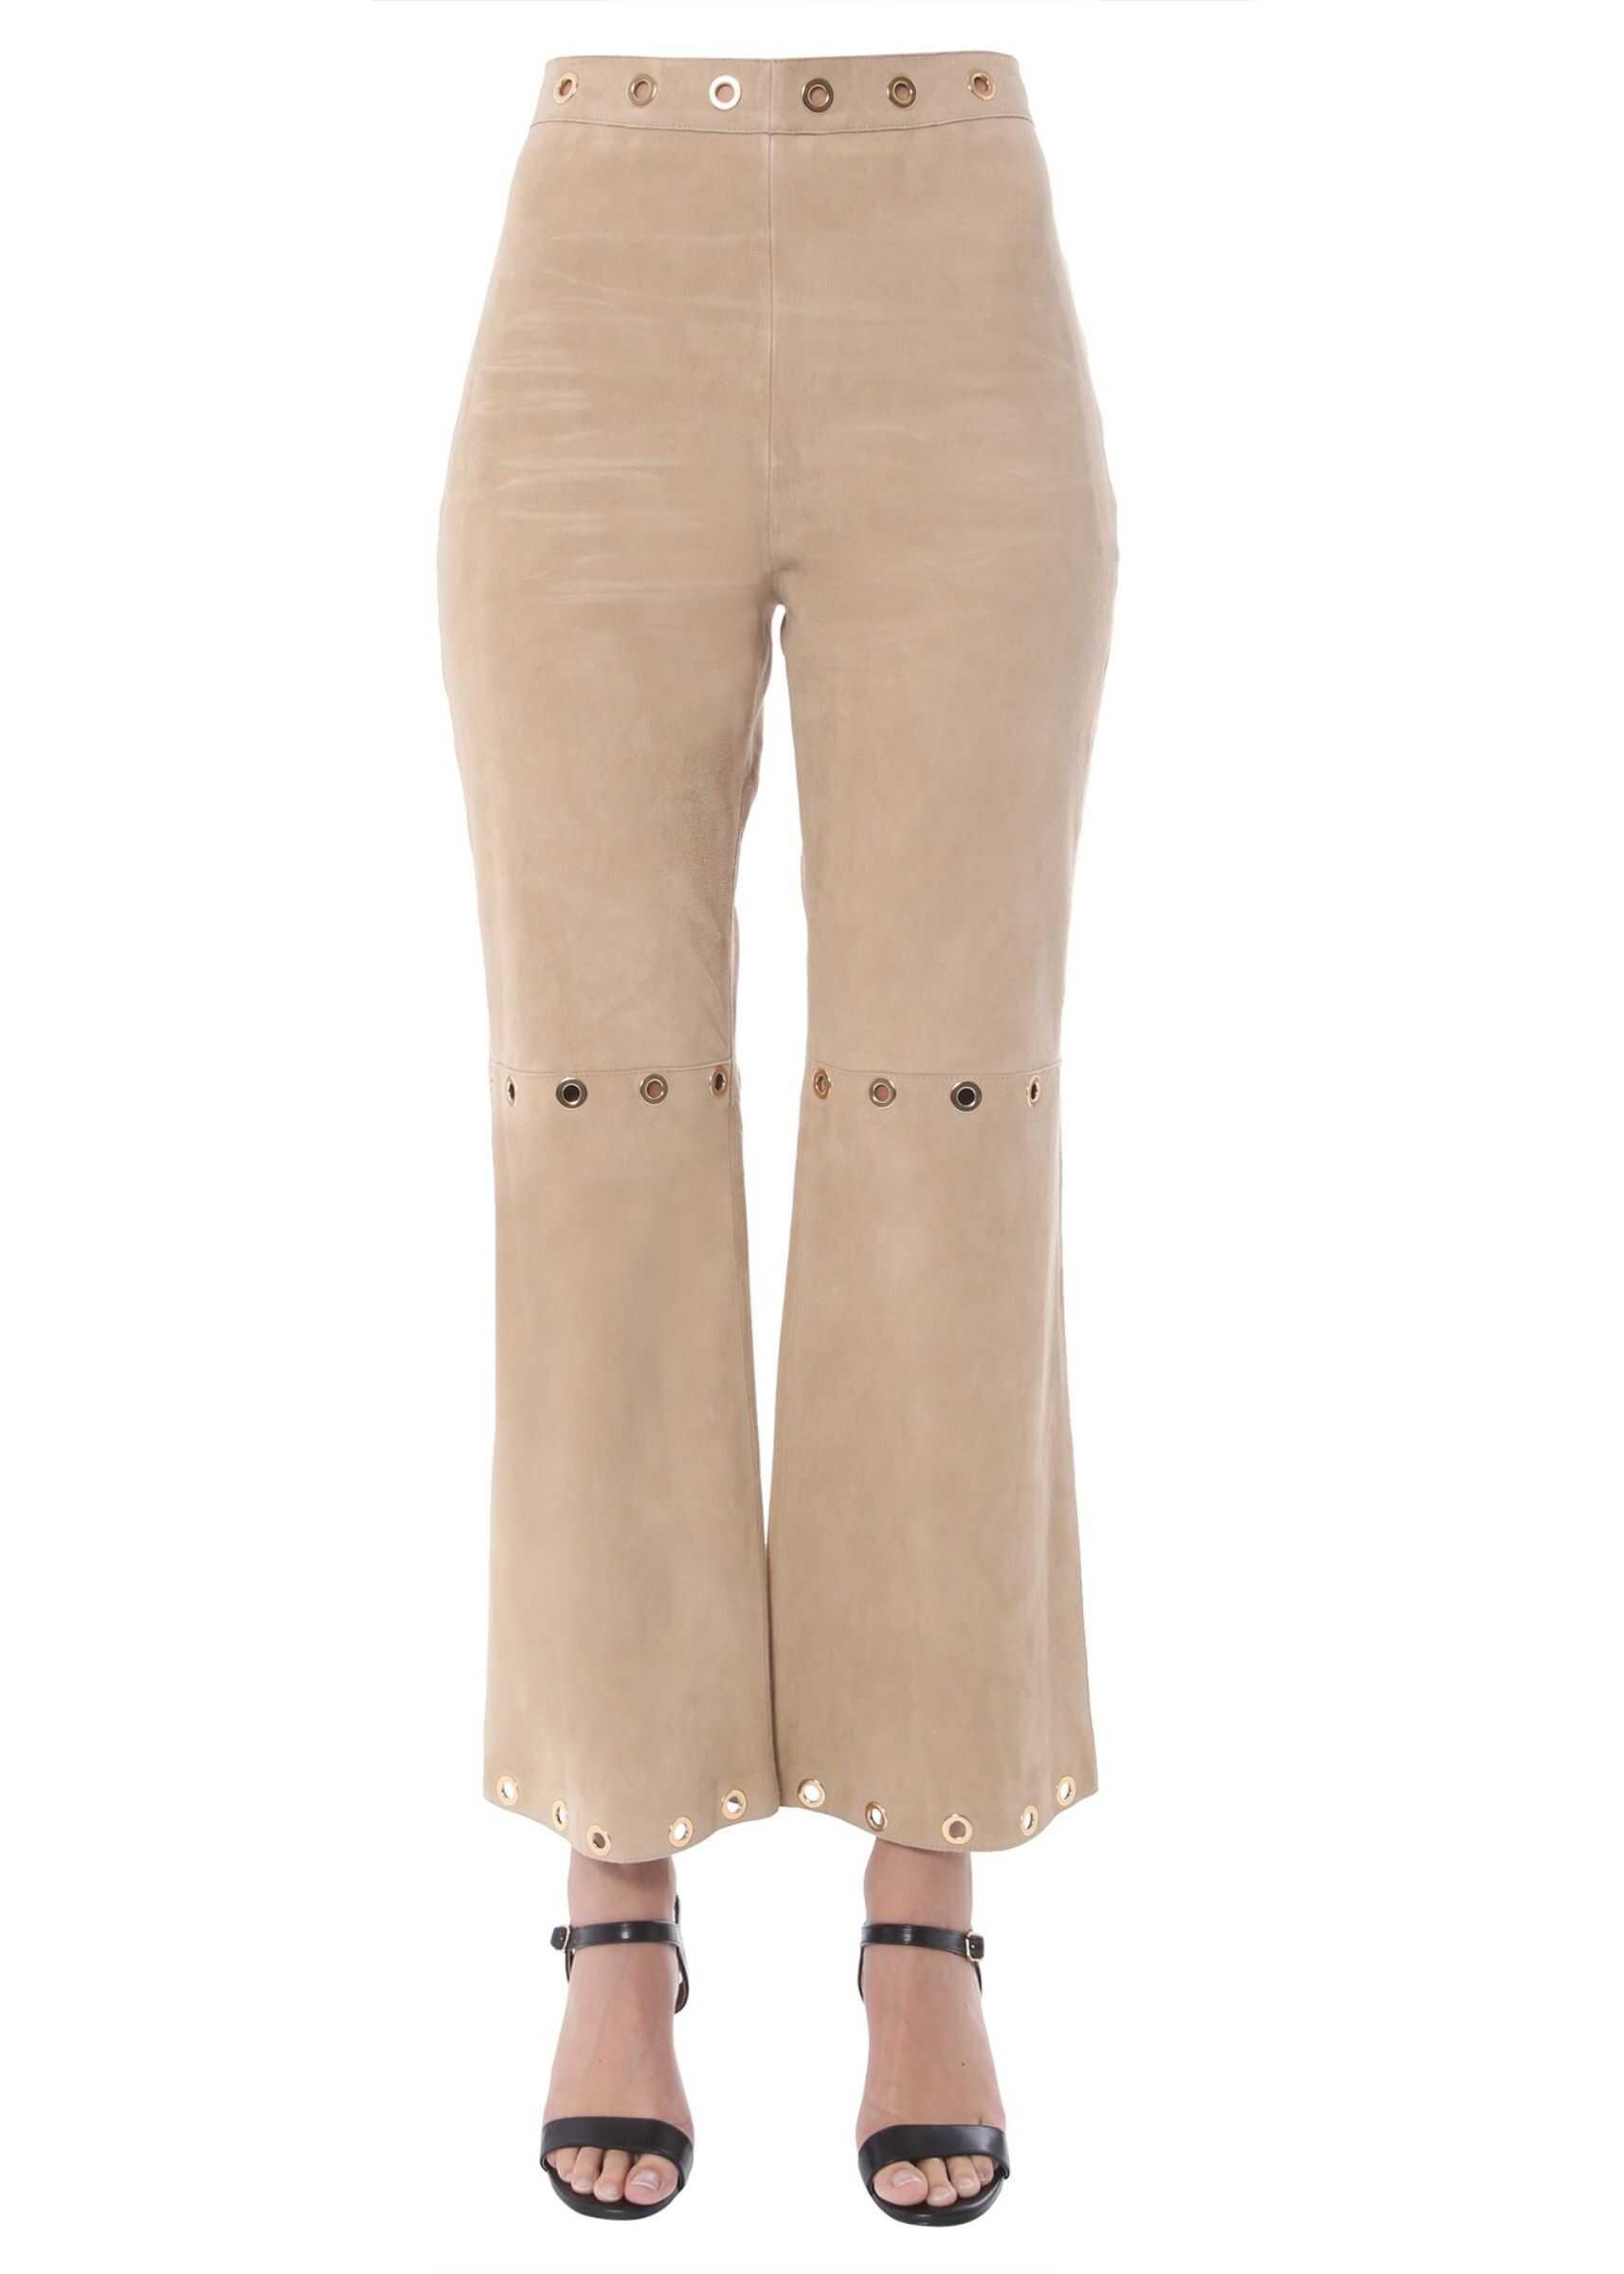 Alberta Ferretti Suede Trousers BROWN